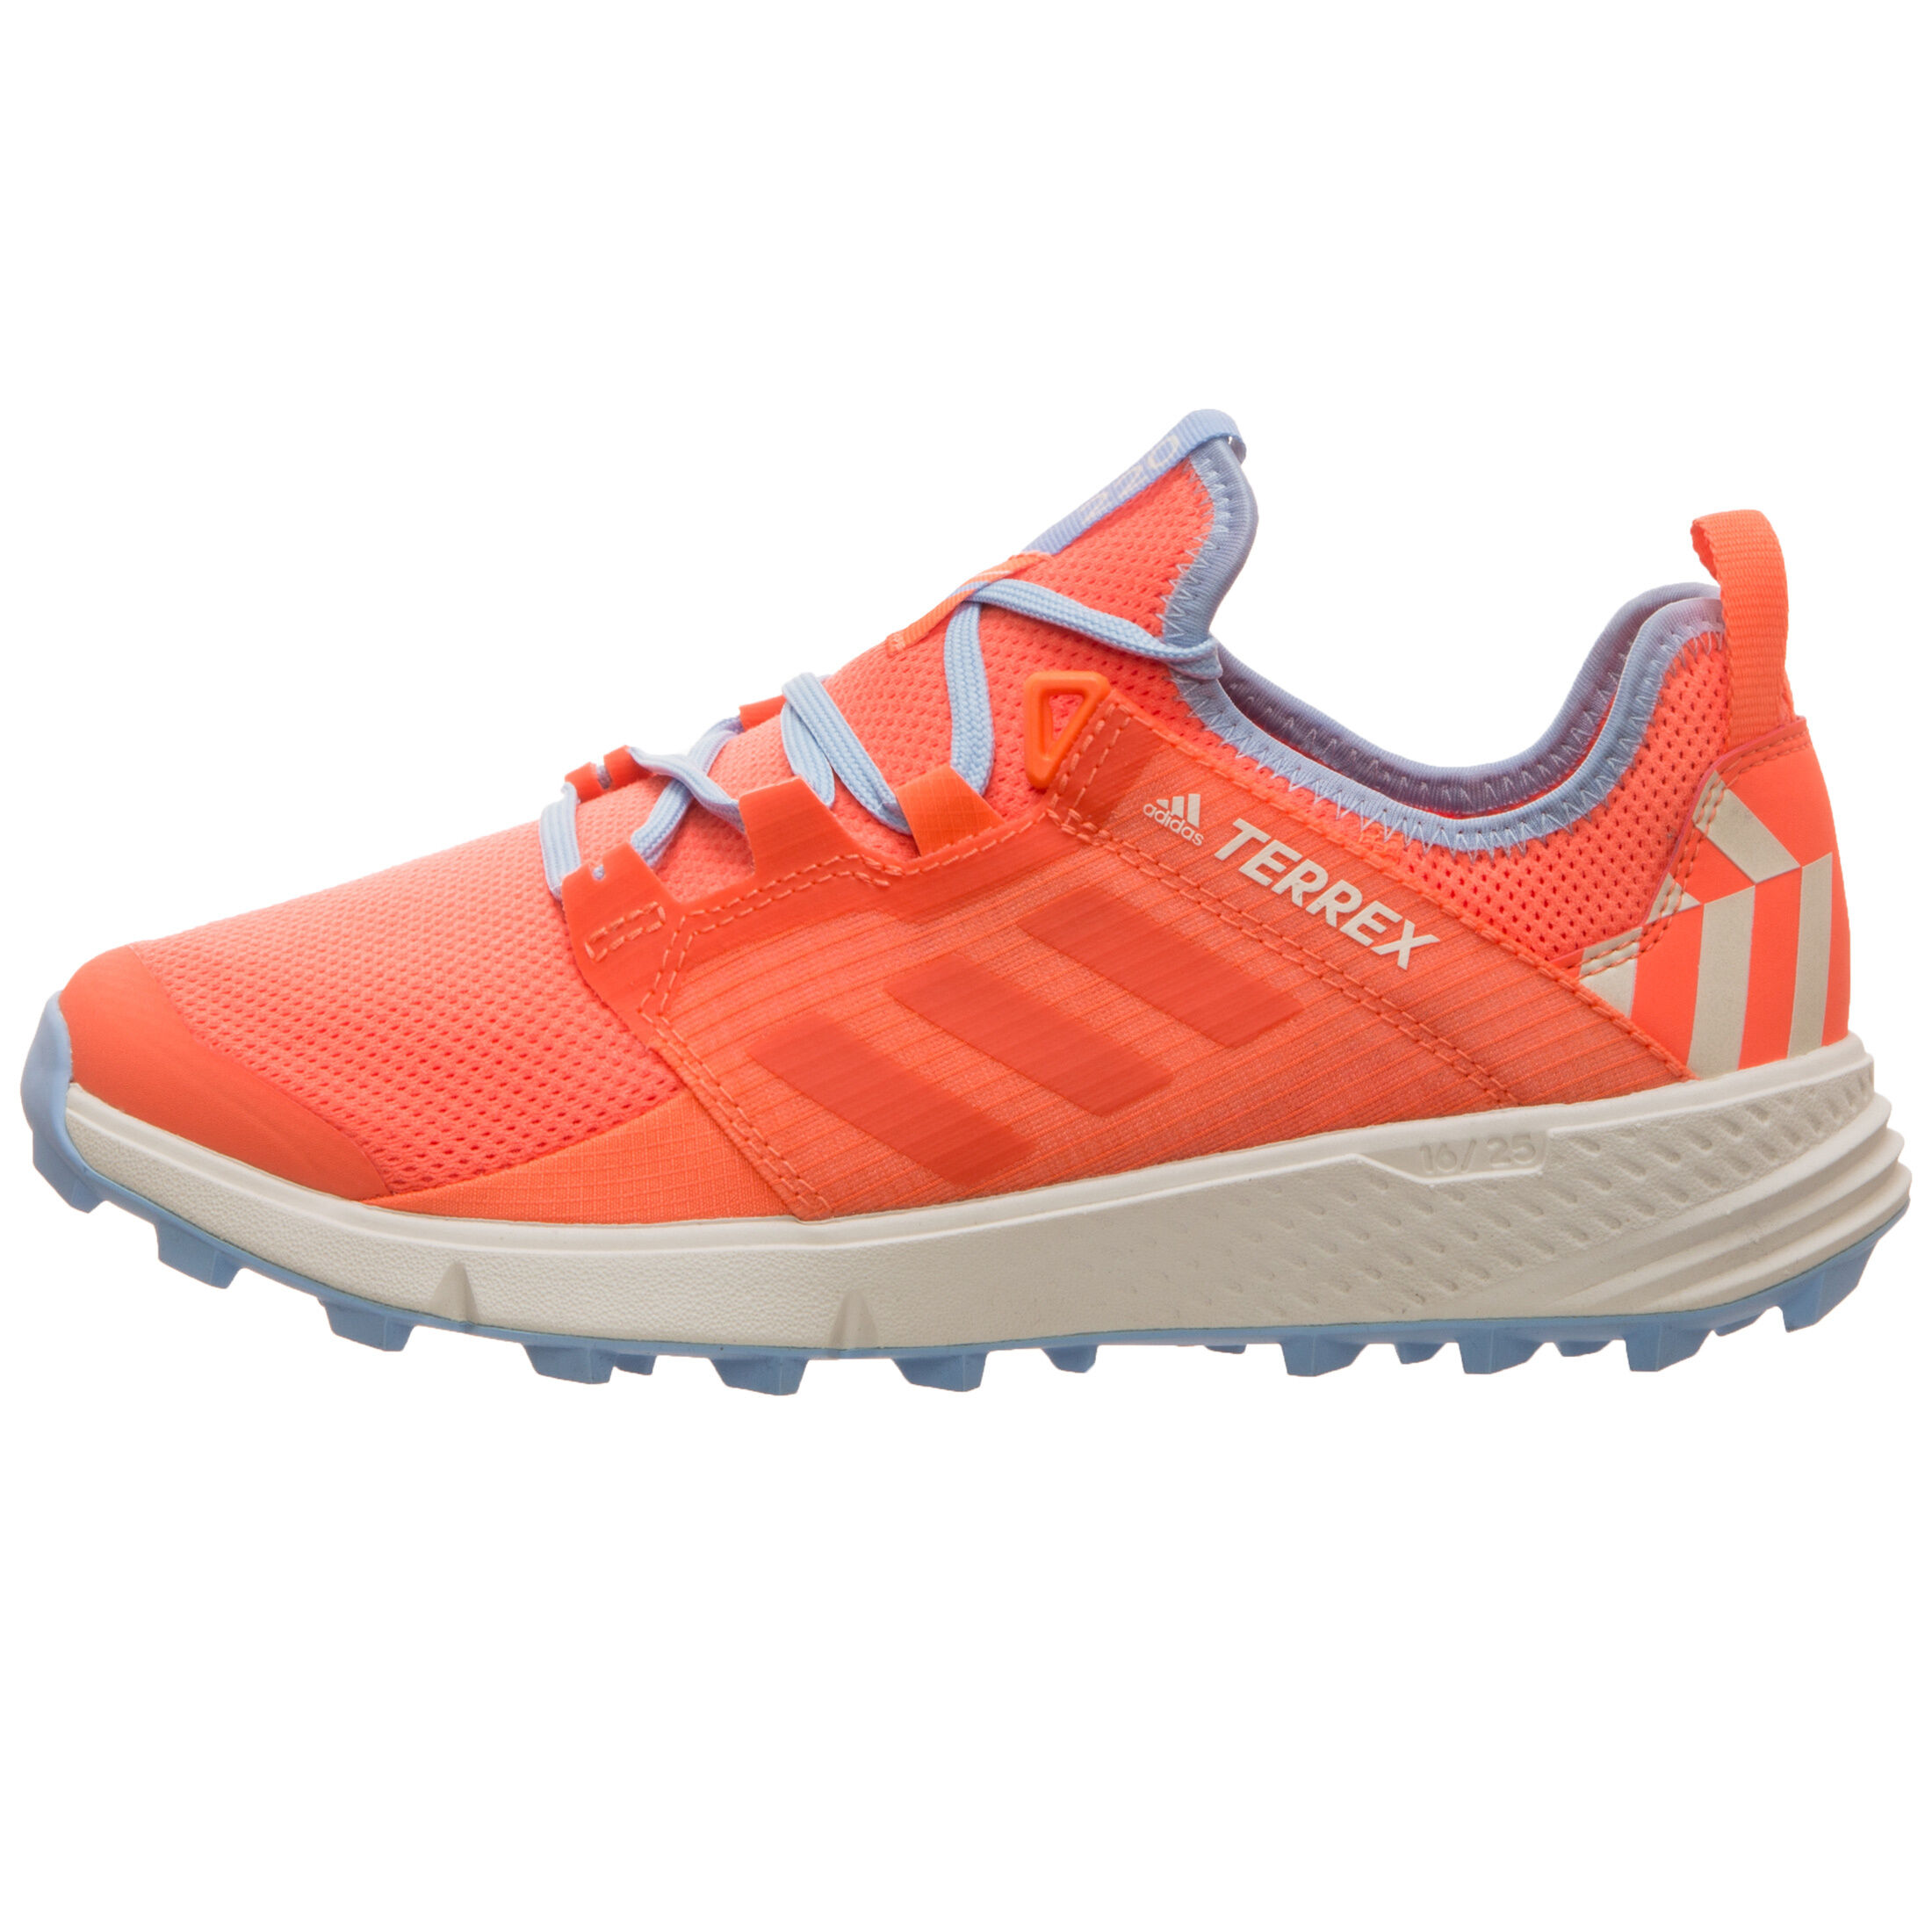 adidas Terrex Speed LD Damen Laufschuh Orange